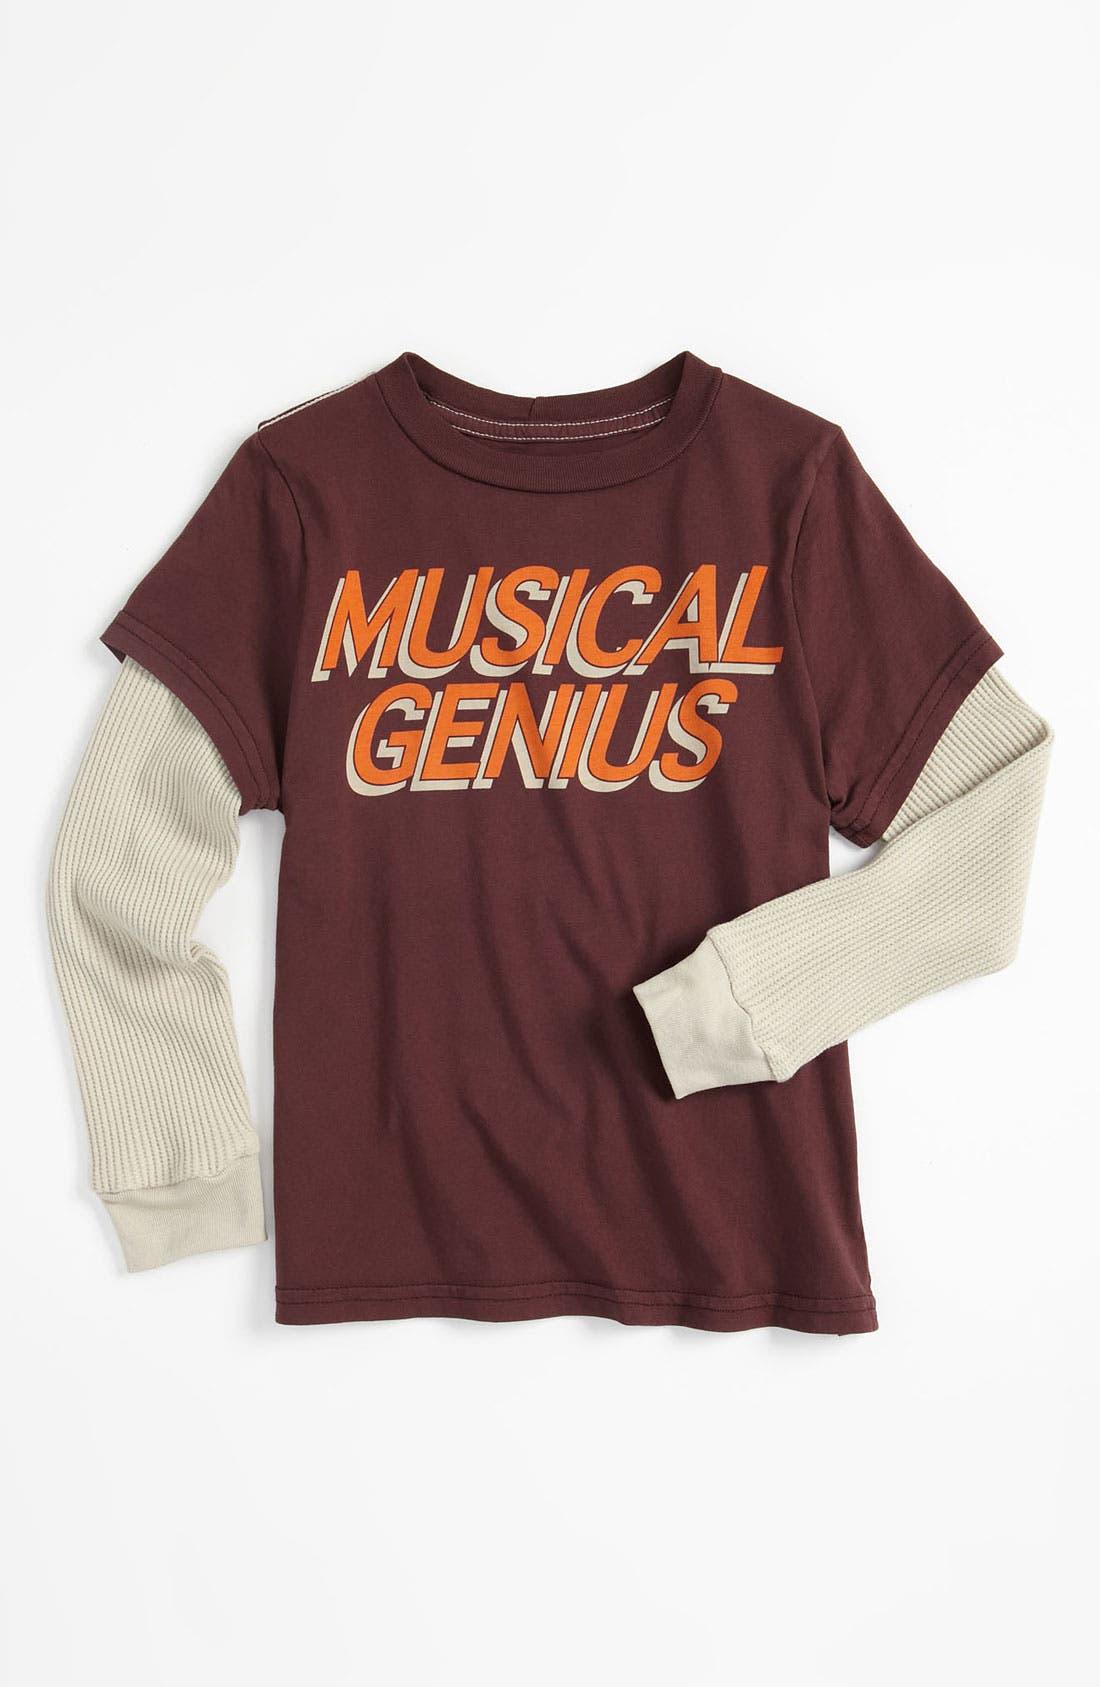 Main Image - Peek 'Musical Genius' T-Shirt (Toddler, Little Boys & Big Boys)